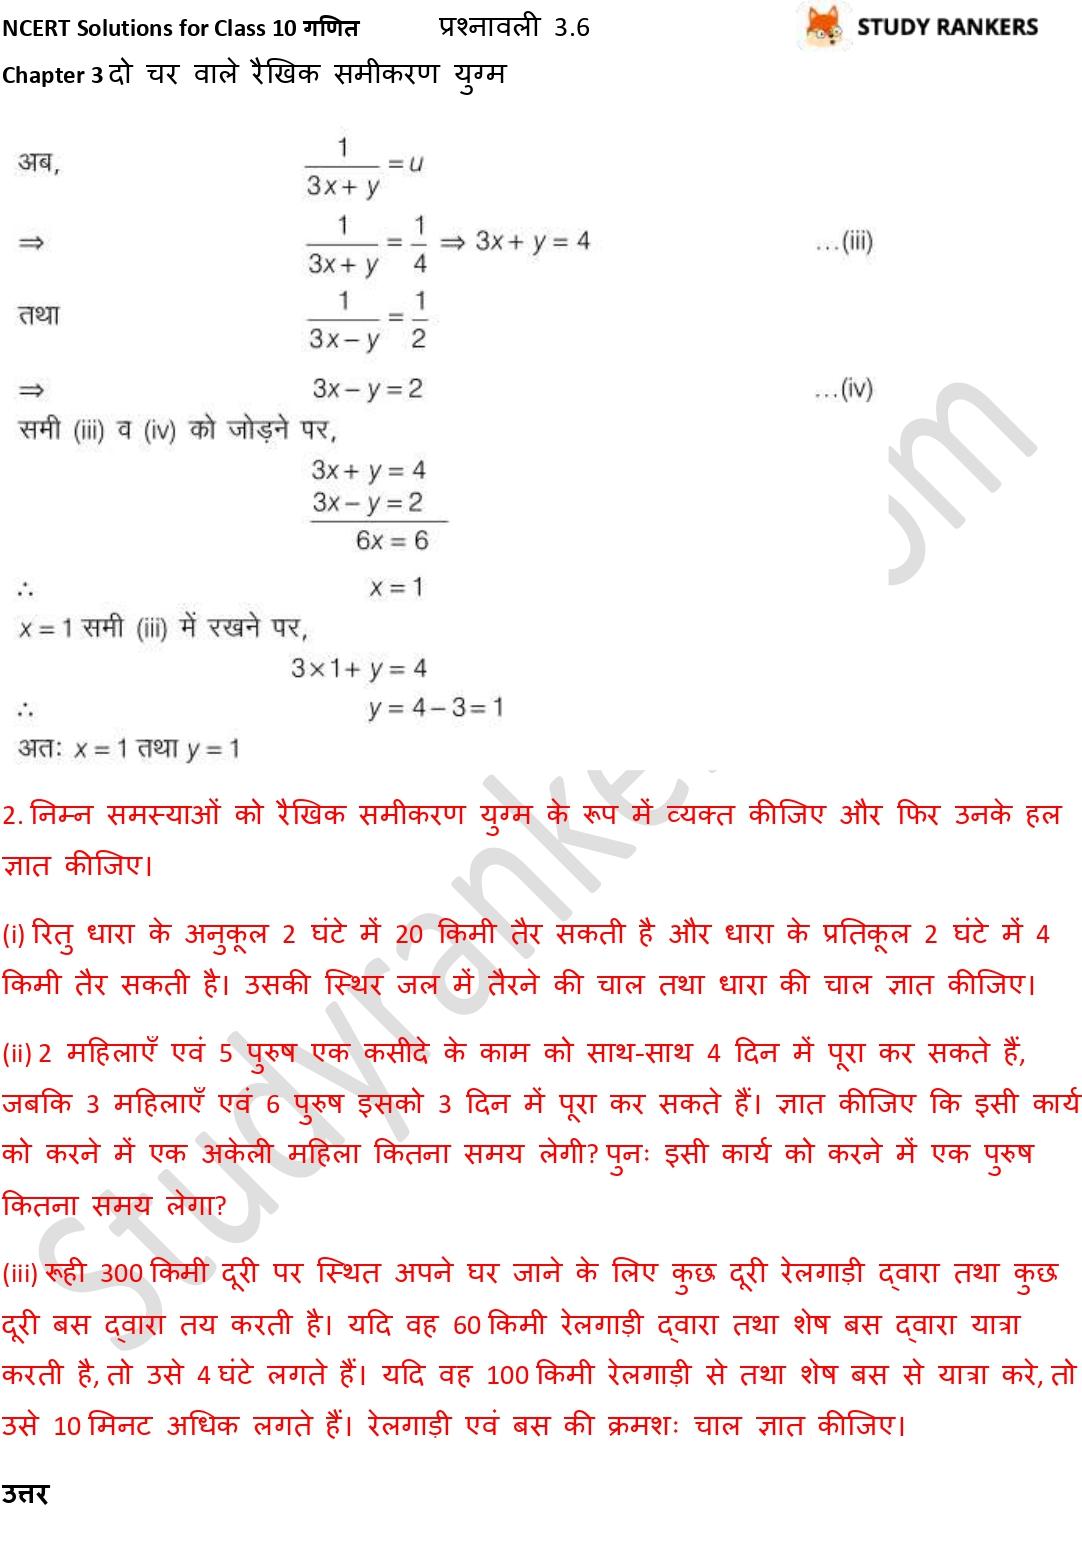 NCERT Solutions for Class 10 Maths Chapter 3 दो चर वाले रैखिक समीकरण युग्म प्रश्नावली 3.6 Part 12